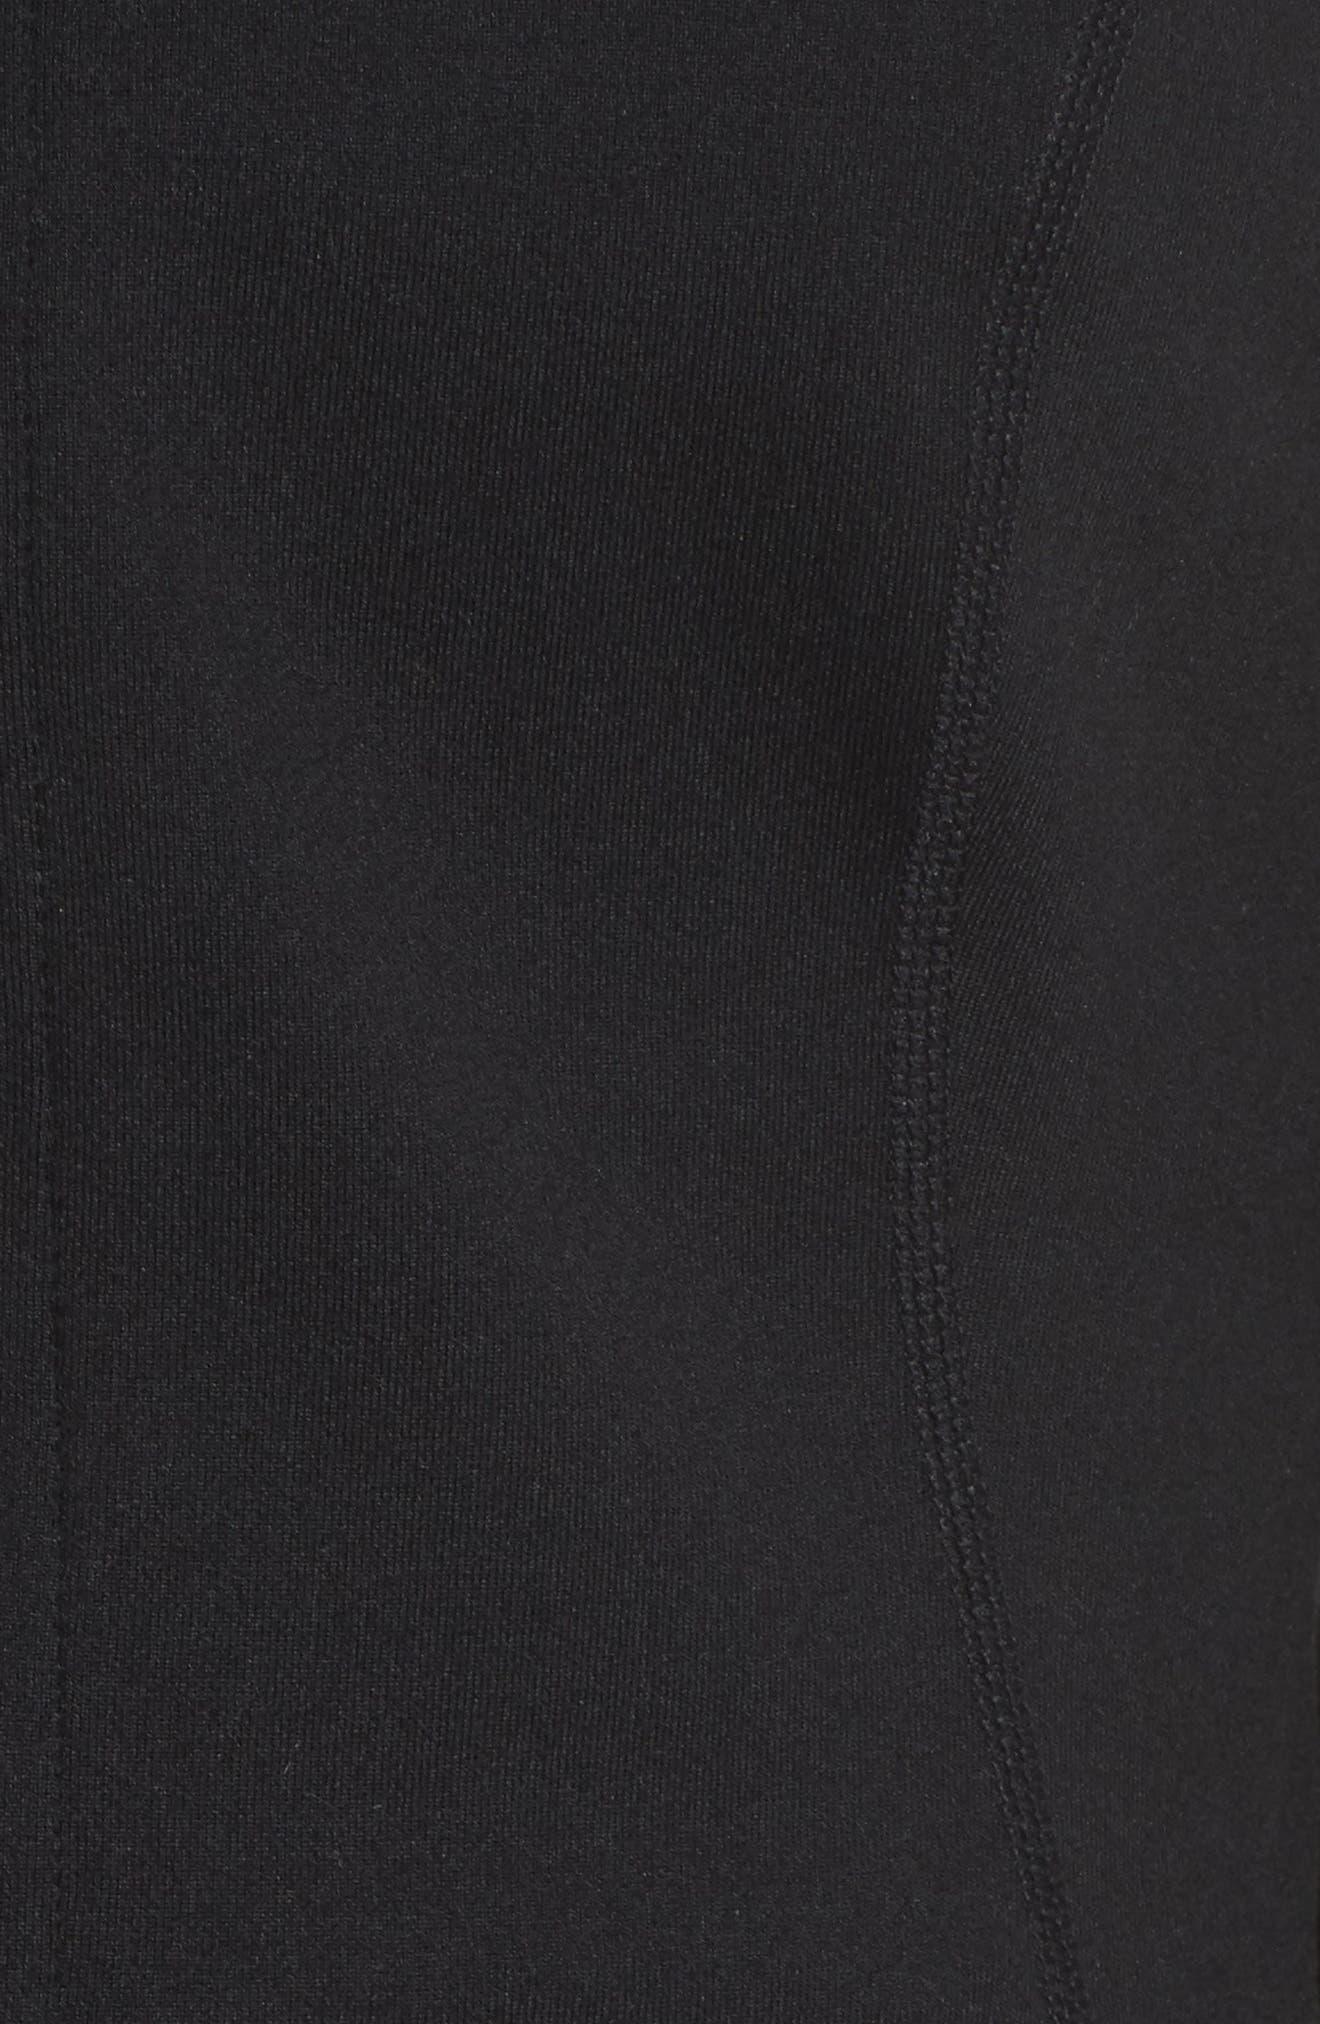 Revolve Jacket,                             Alternate thumbnail 6, color,                             Black